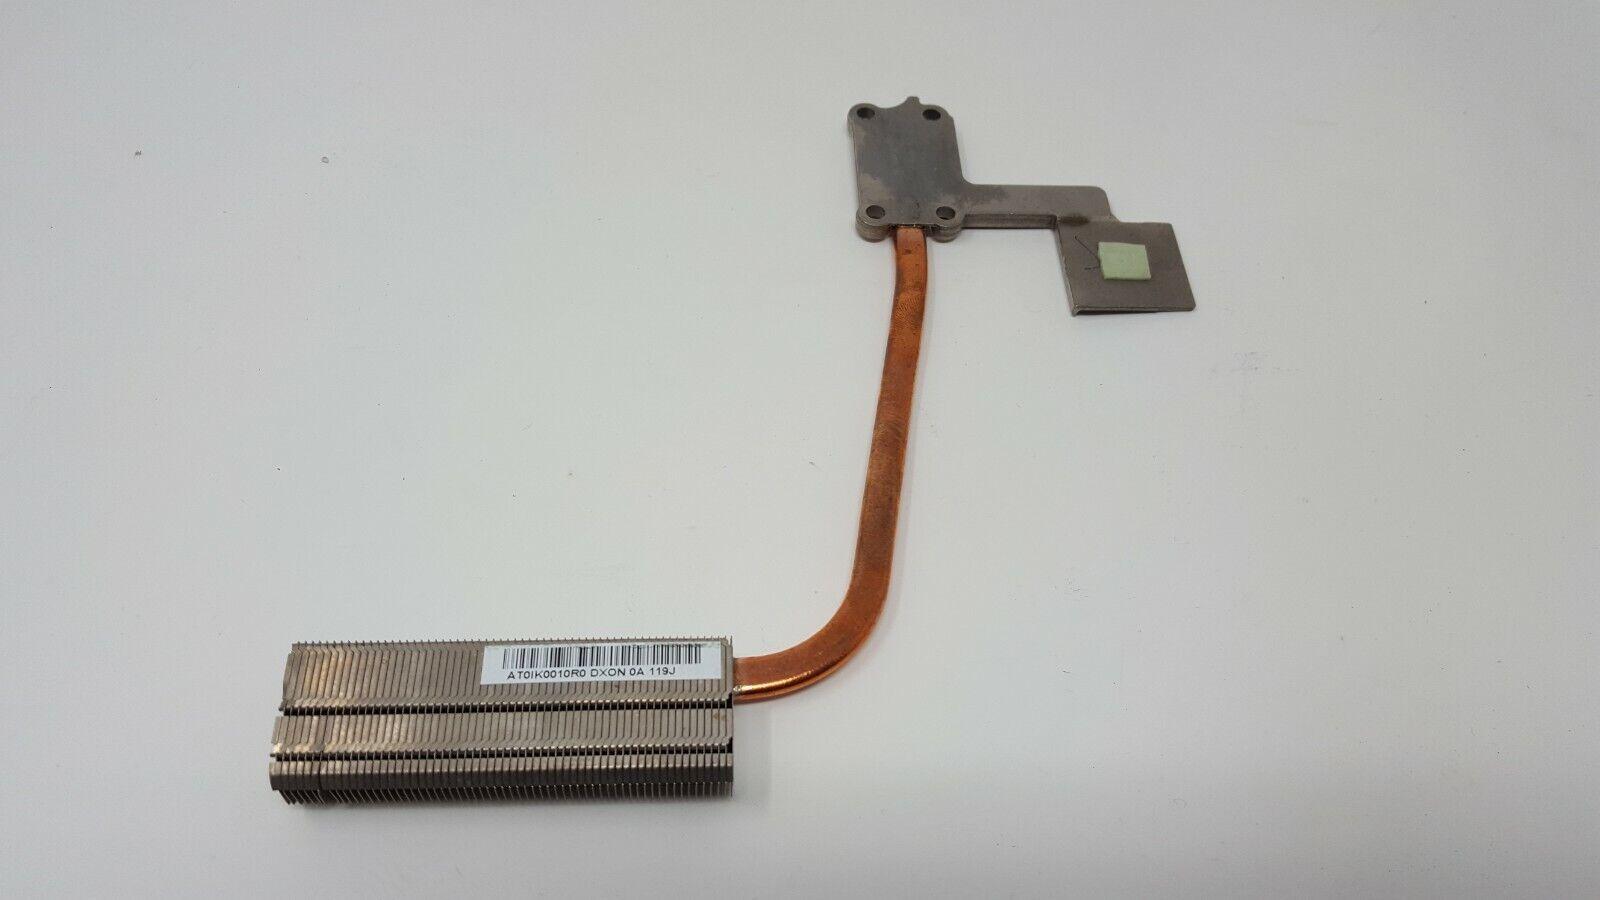 Genuine Toshiba Satellite C660 C660D Laptop CPU Cooling Heatsink AT0IK0010R0